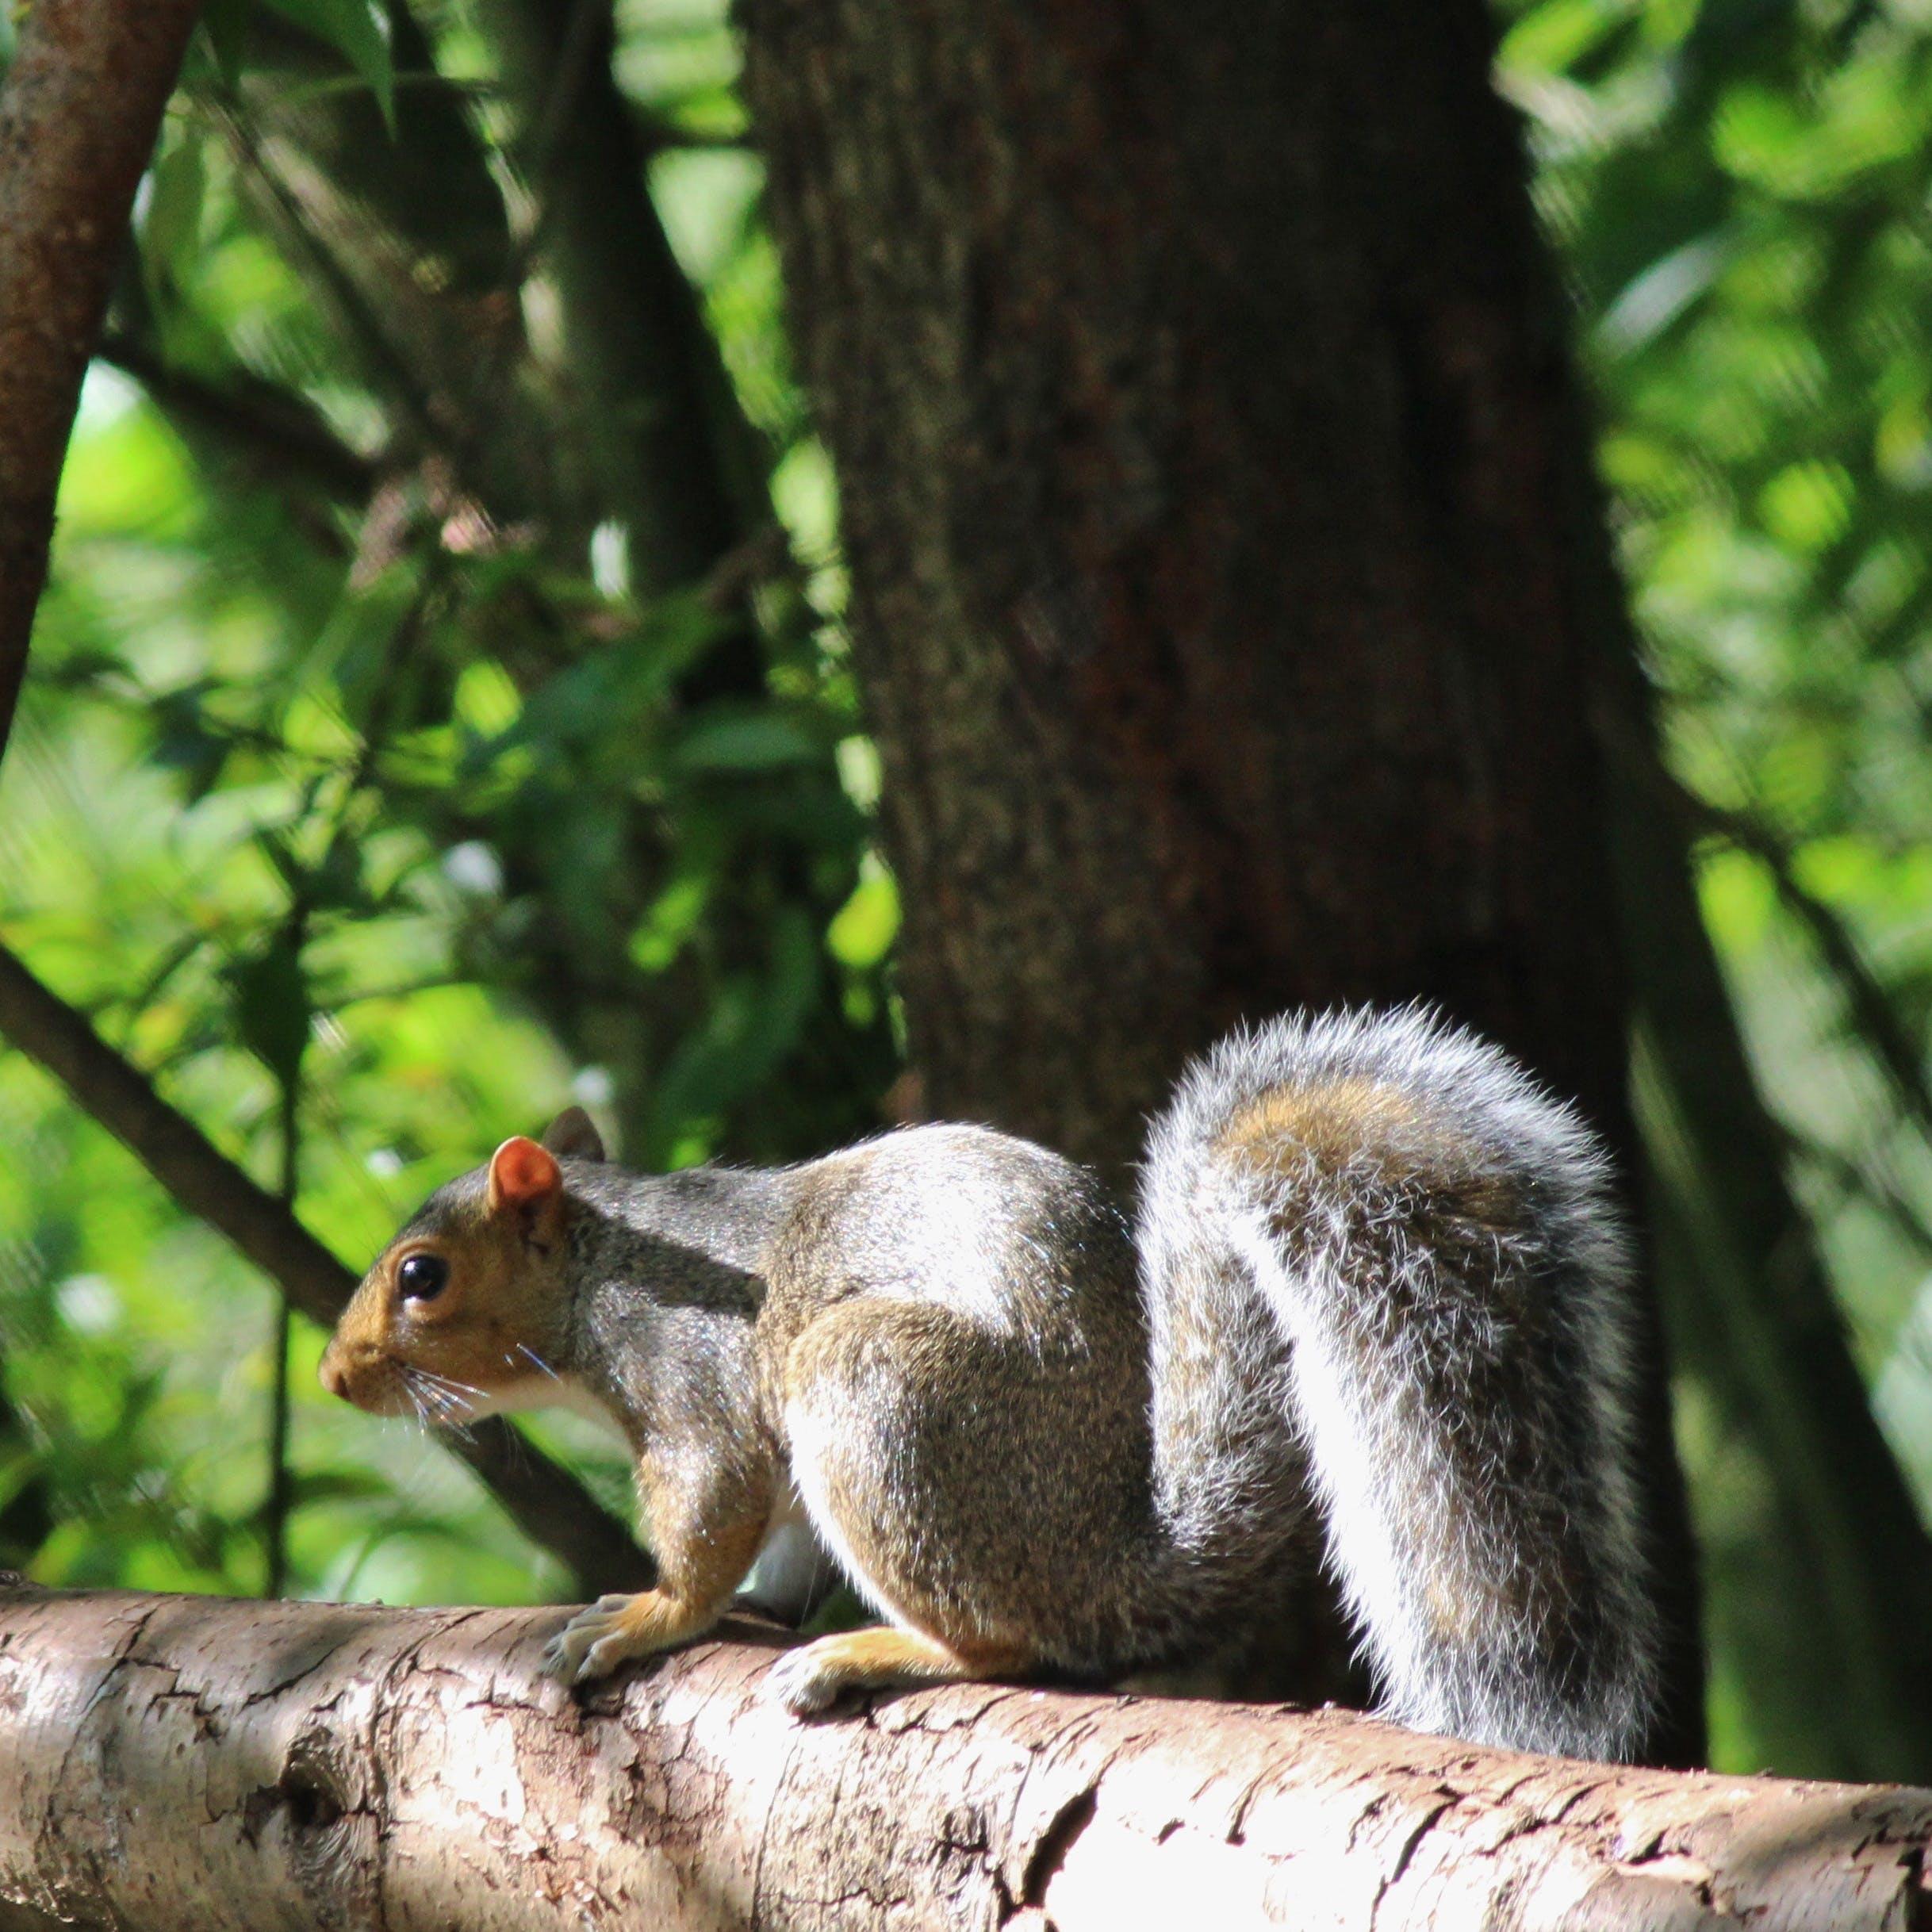 Free stock photo of #squirrel #greysquirrel #trees #wildlife